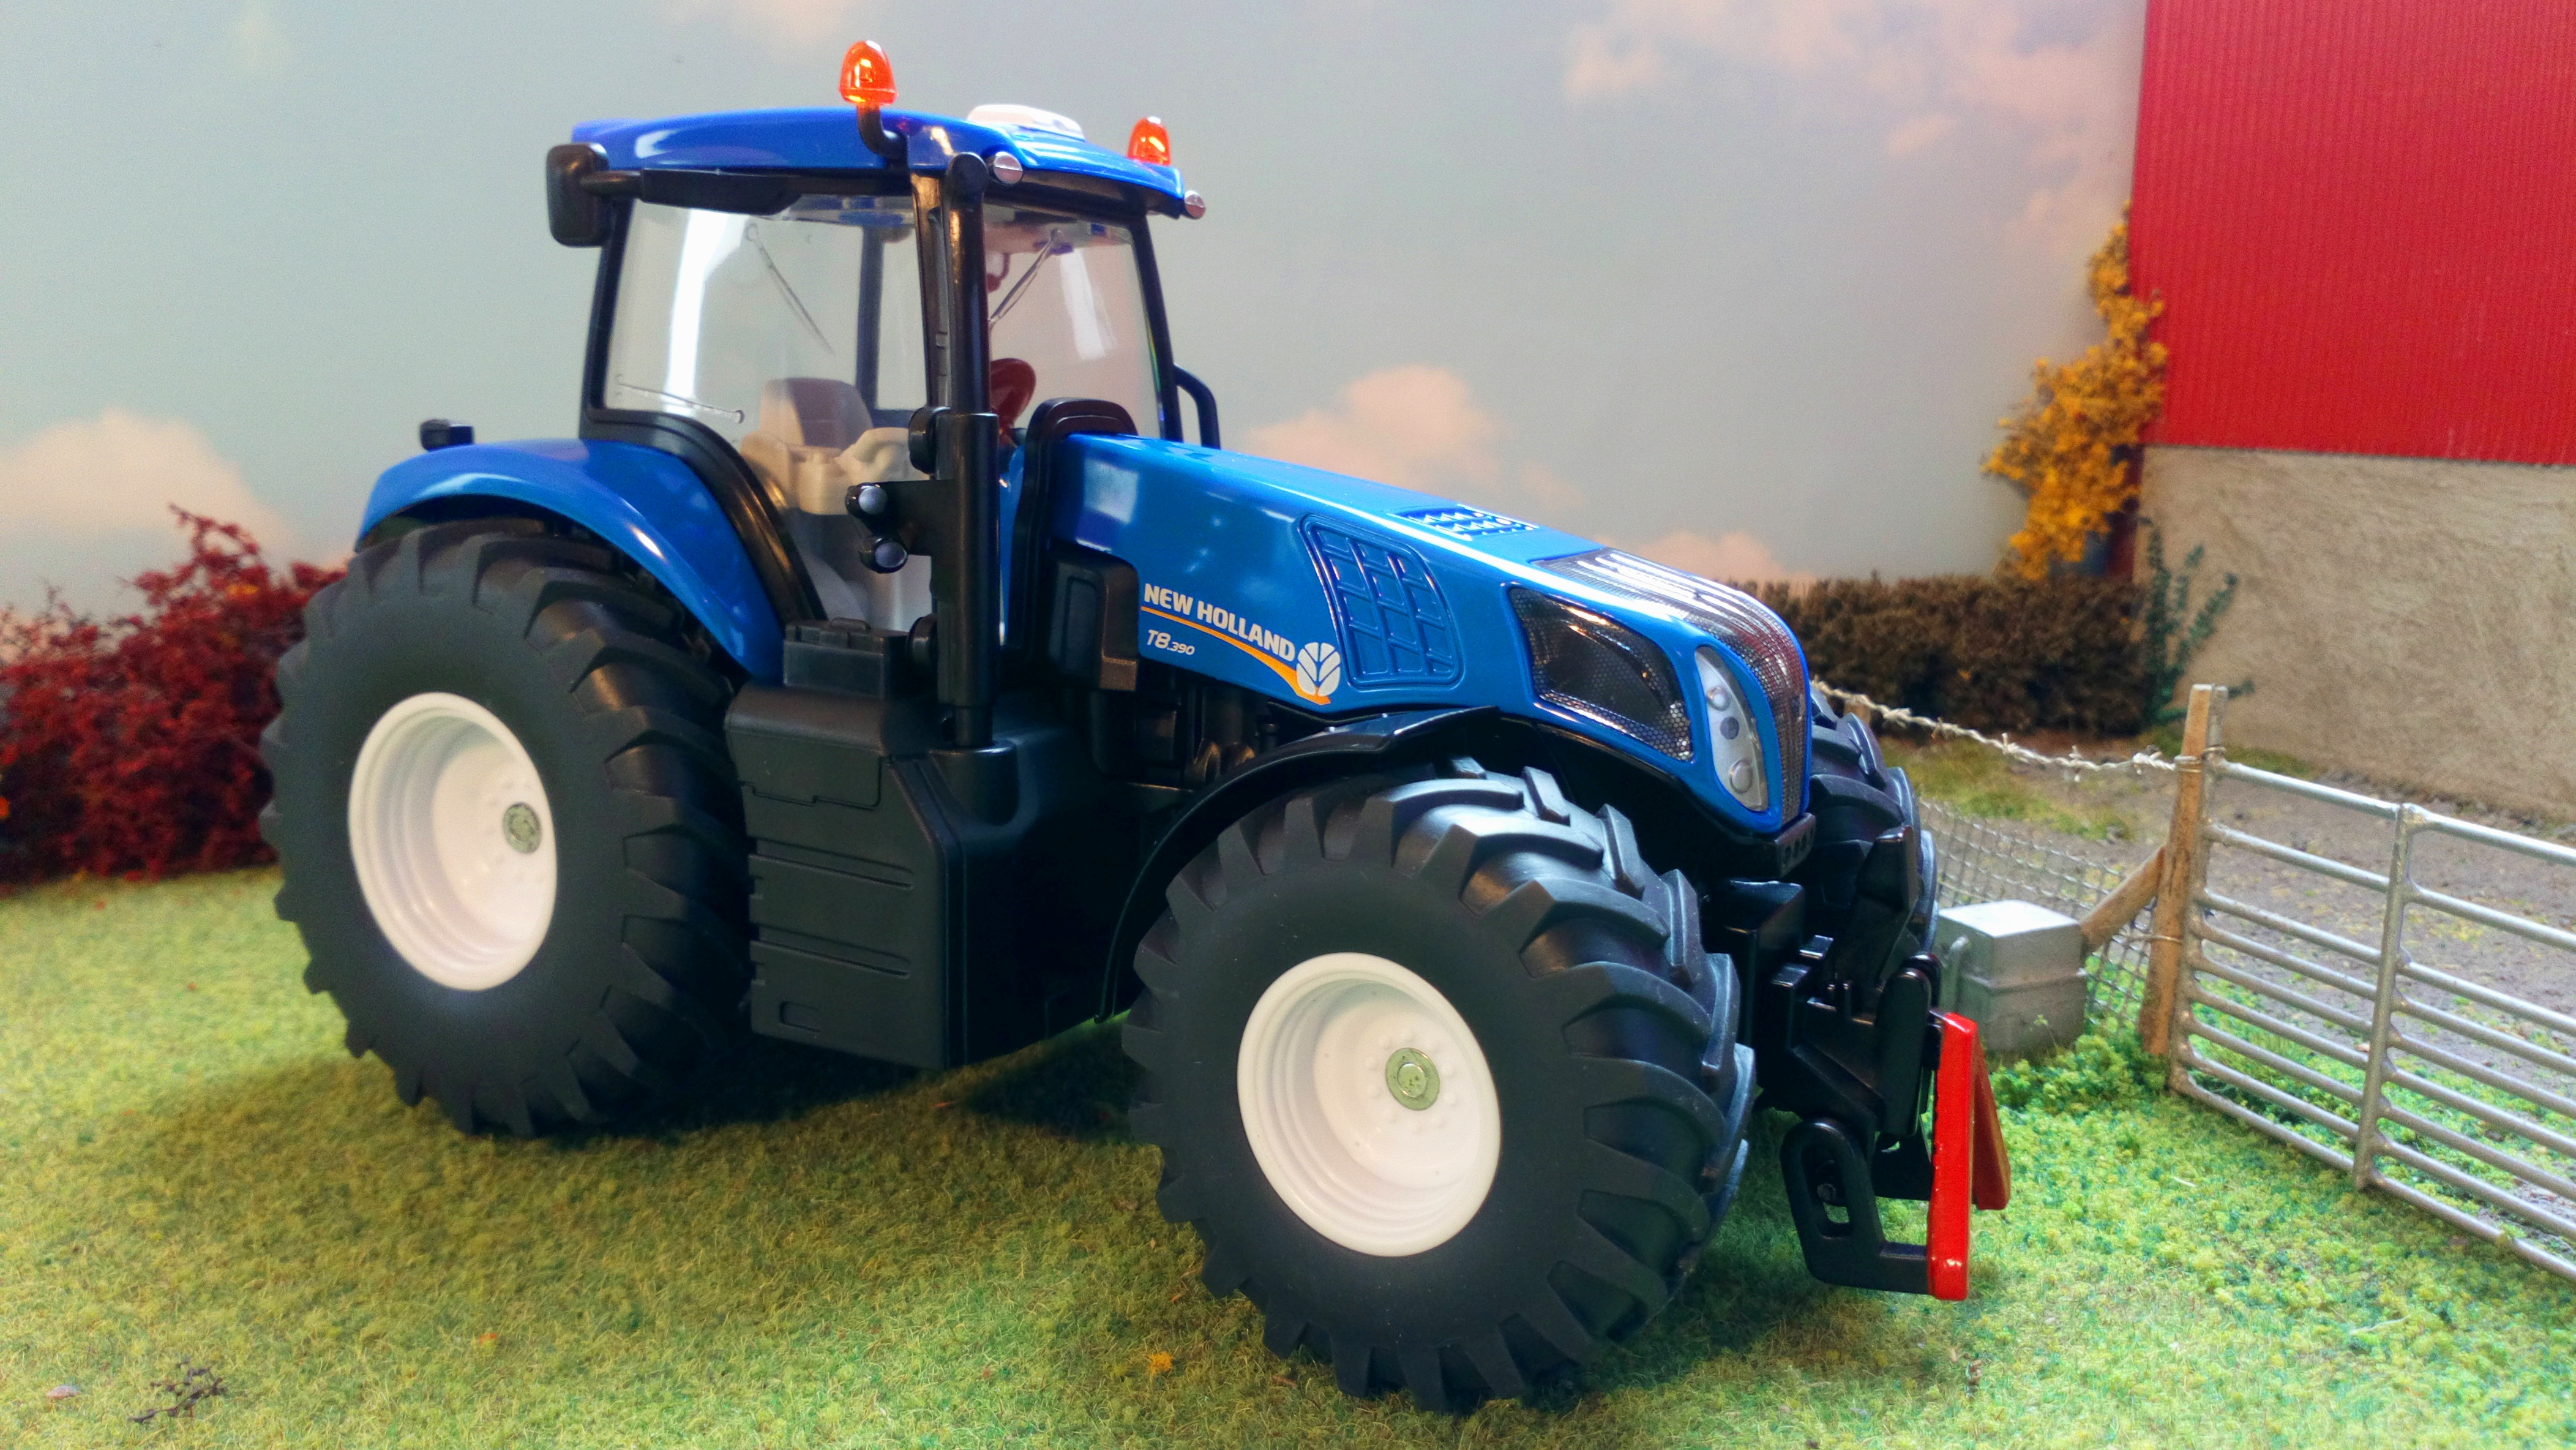 SIKU 3273 Tractor New Holland T8.390